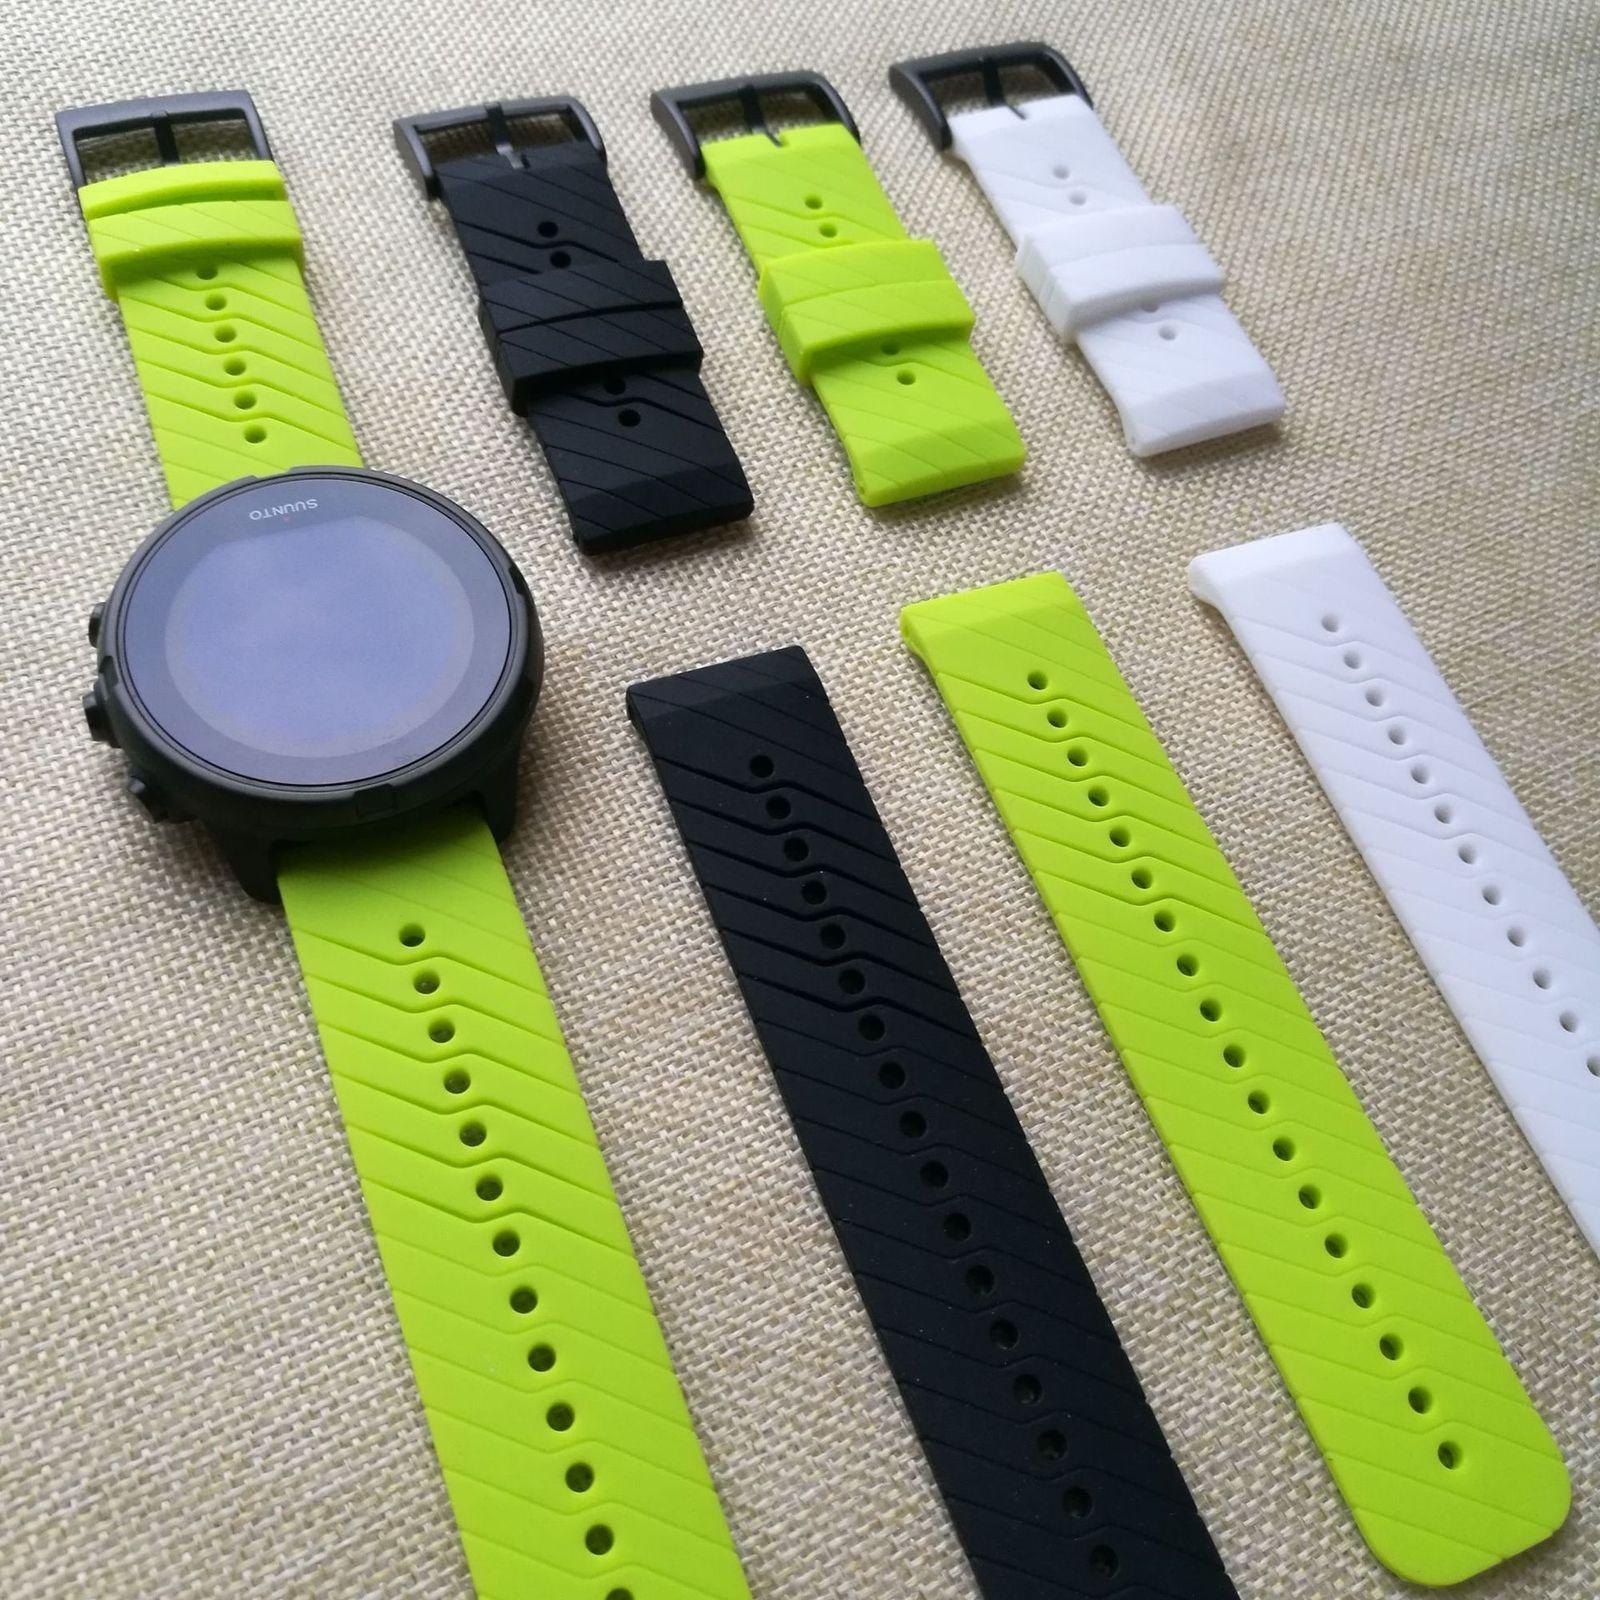 Suunto 9 Suunto 용 고무 시계 밴드 Spartan Baro Watch 실리콘 스트랩 손목 밴드 24mm